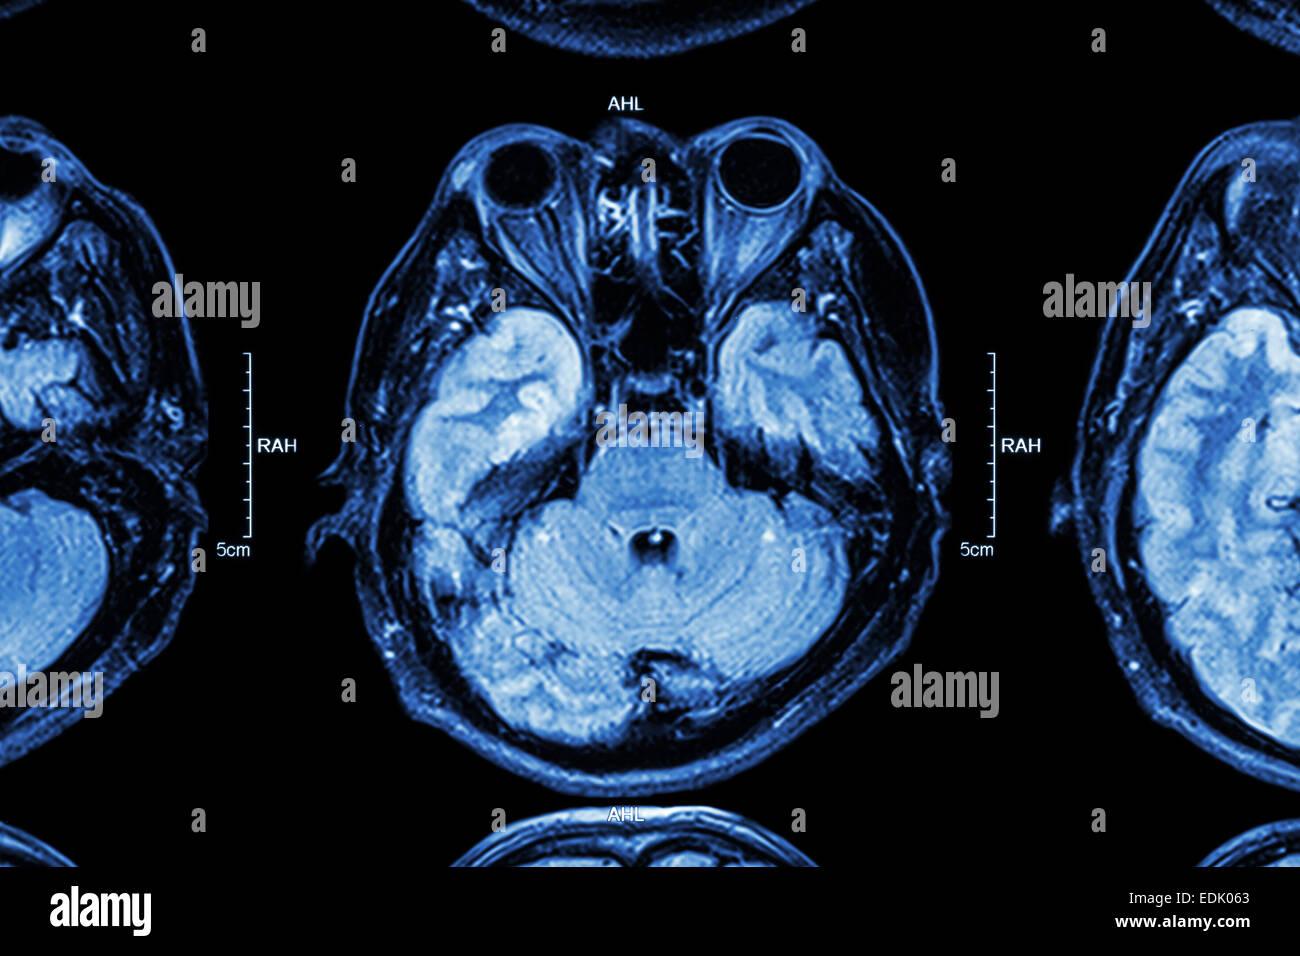 Close up of MRI brain : Lower part of brain ( eyes , temporal lobe of cerebrum , cerebellum , brain stem ) - Stock Image